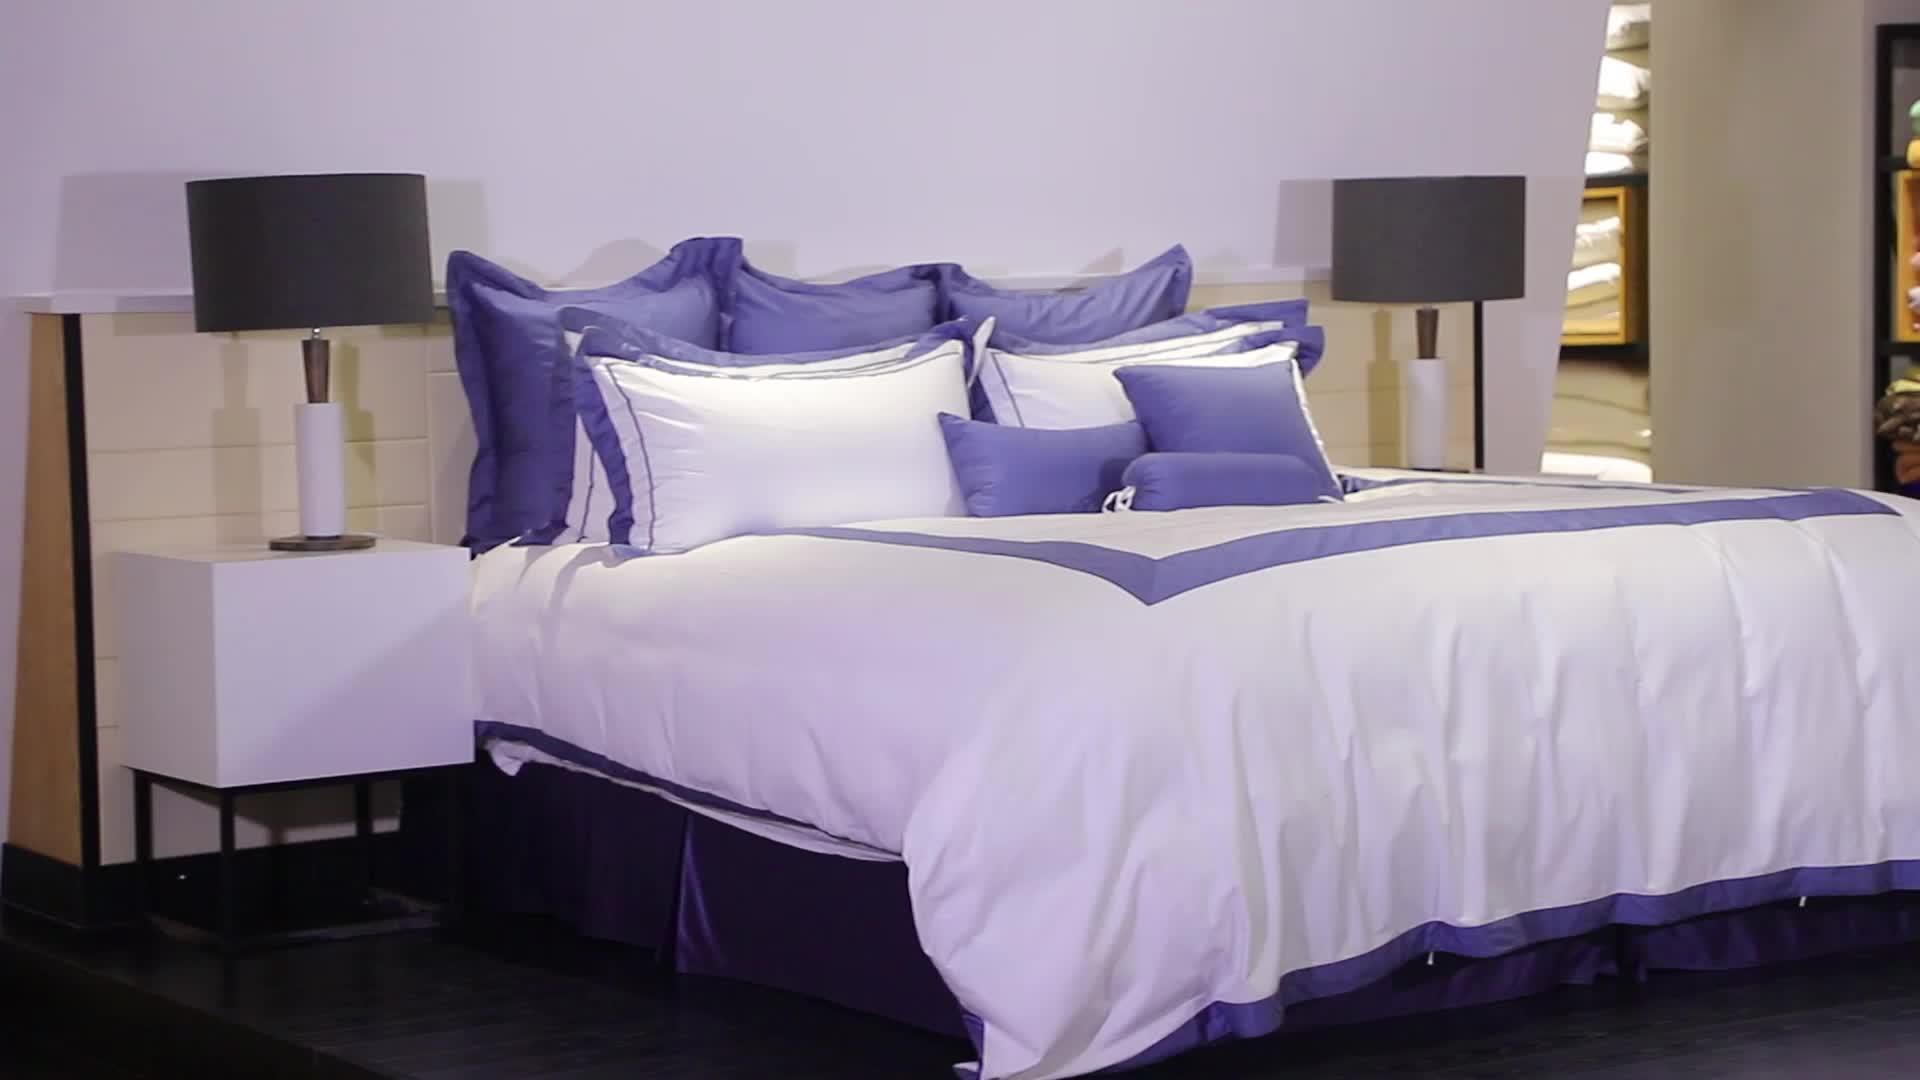 ELIYA Atacado Colchas de Hotel de Luxo De Alta Qualidade Elegante